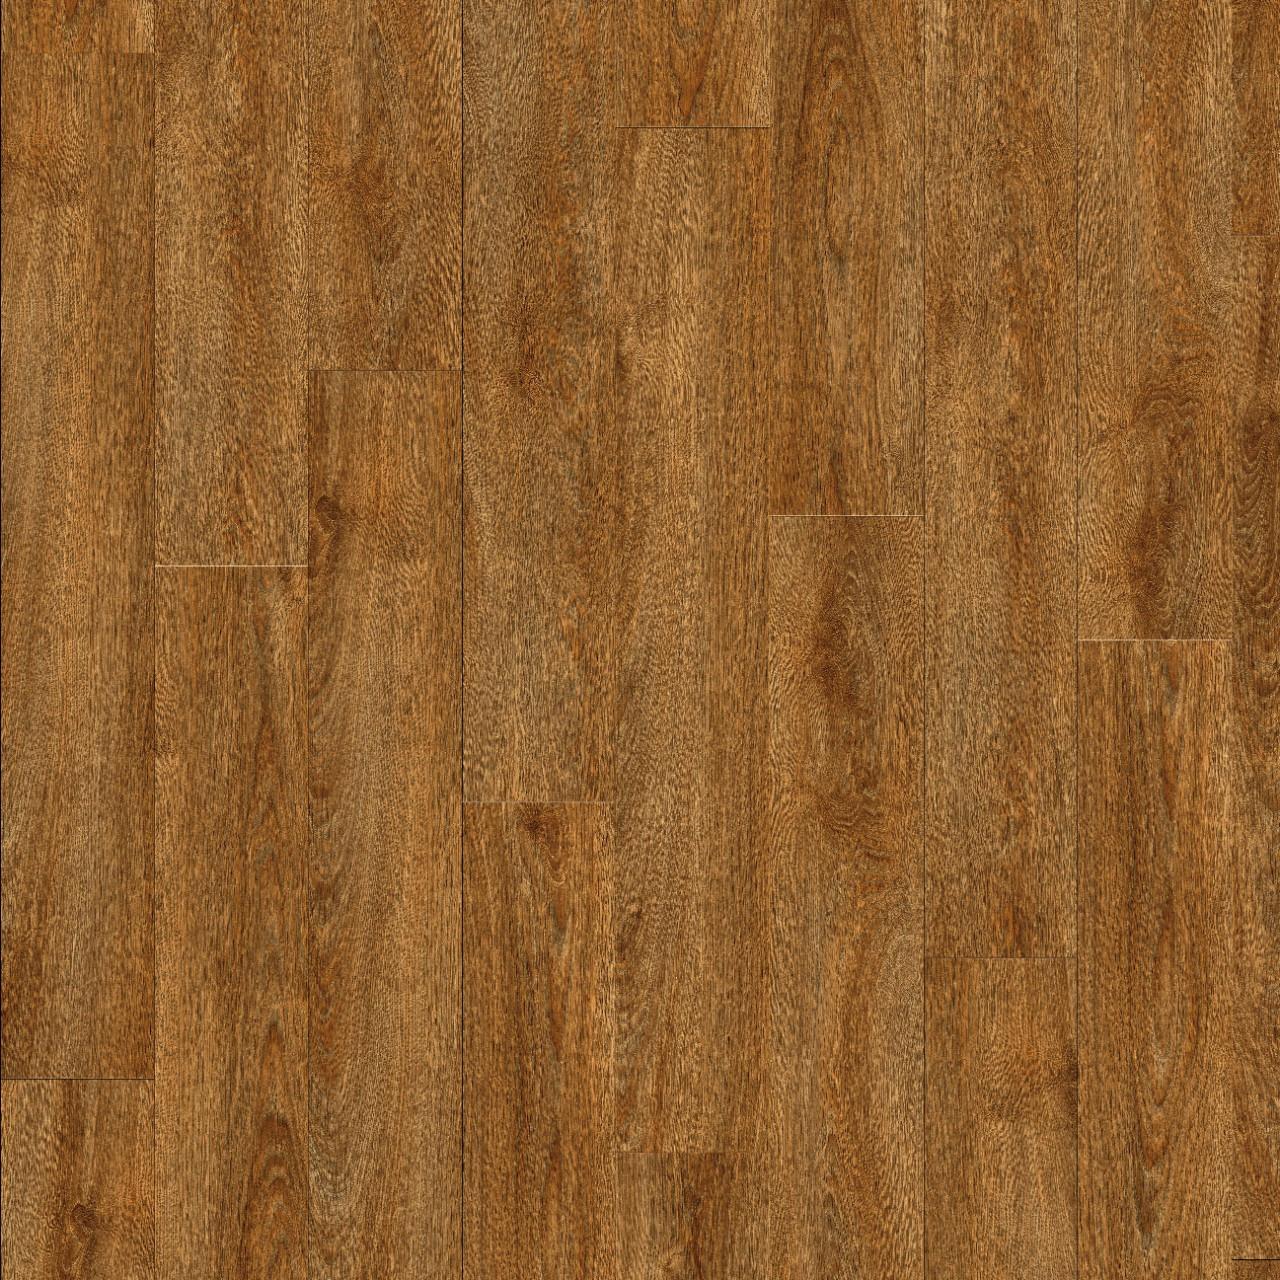 Виниловая Доска Moduleo Select Midland Oak 22821